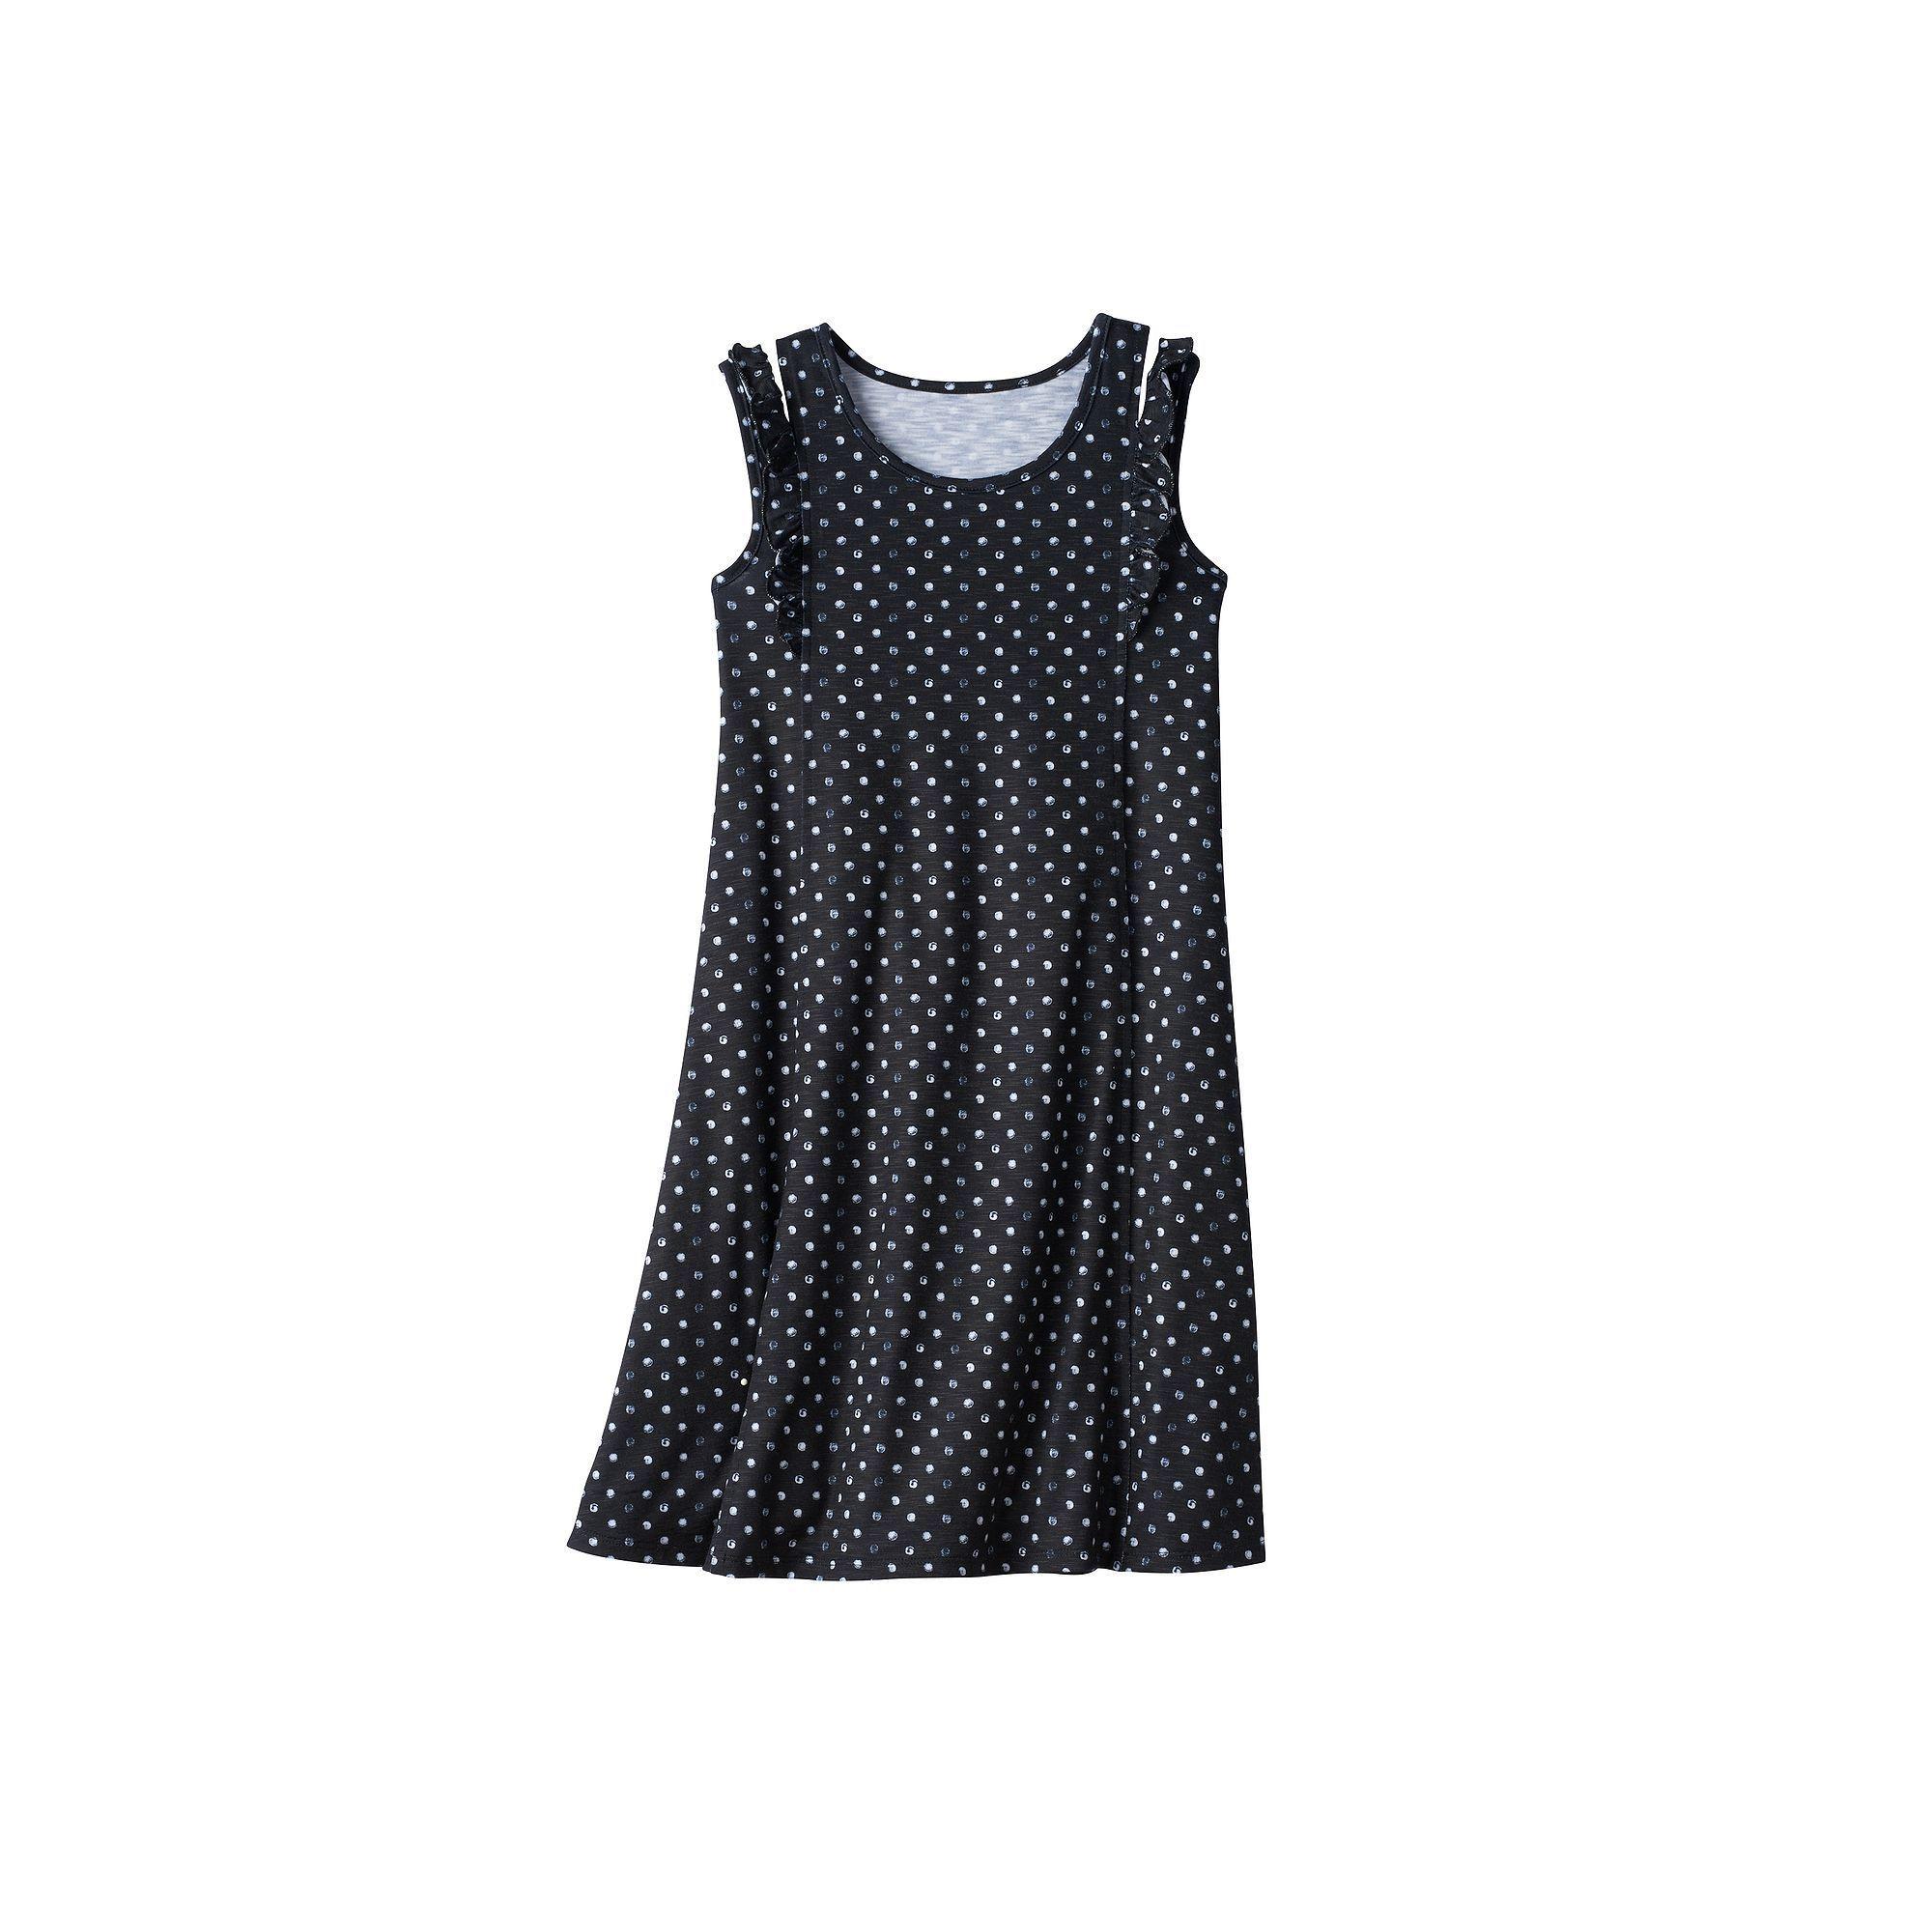 Girls u plus size sopatterned ruffle shoulder knit dress